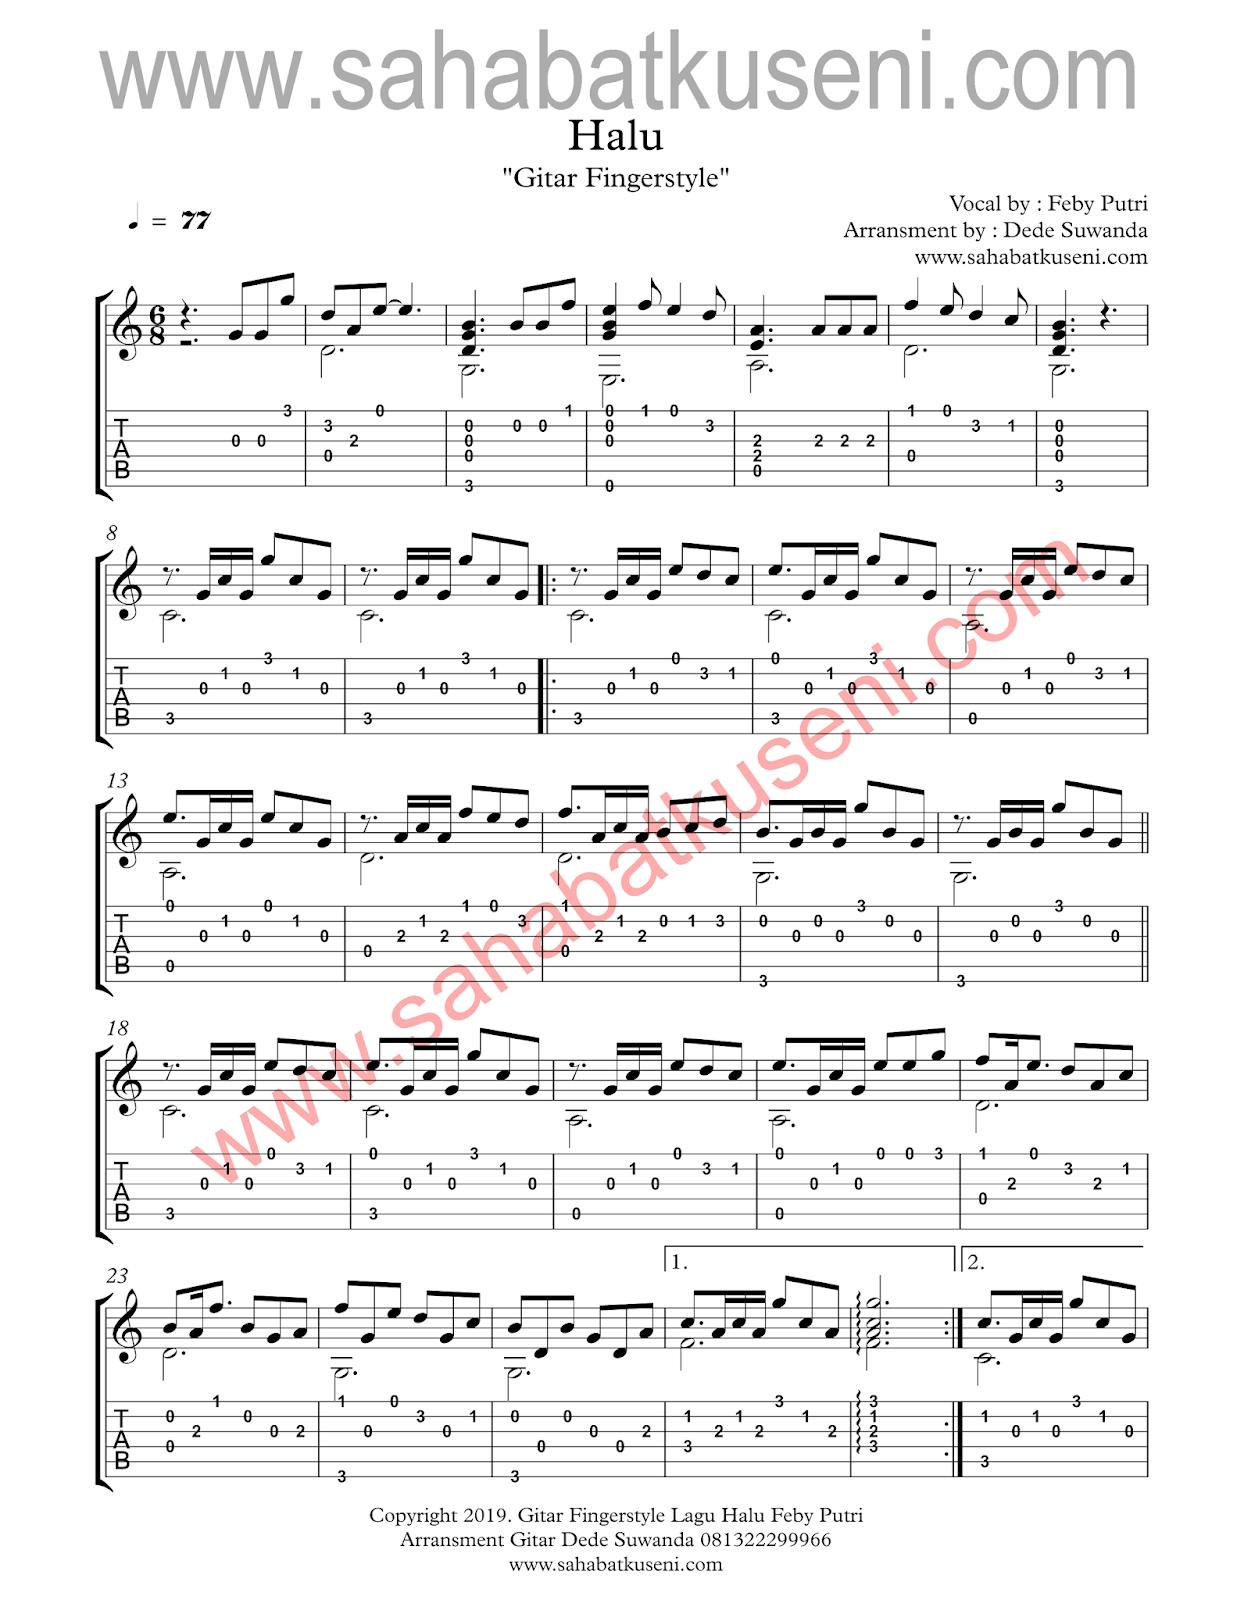 Tab dan Not Balok Gitar Fingerstyle Lagu Halu Karya Feby Putri